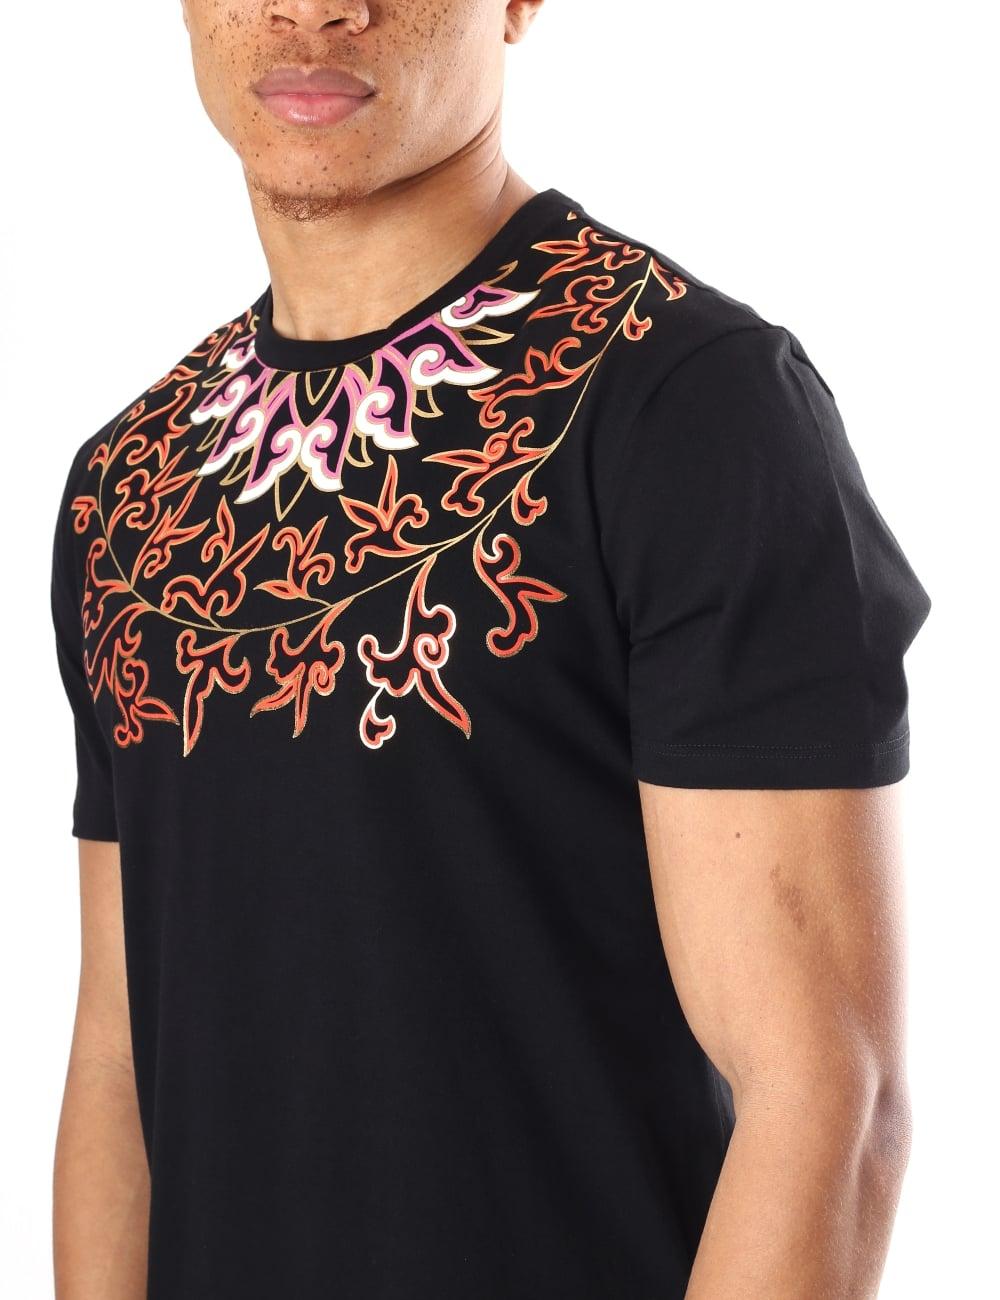 964a9c95 Versace Collection Men's Floral Print Crew Neck Short Sleeve T-Shirt